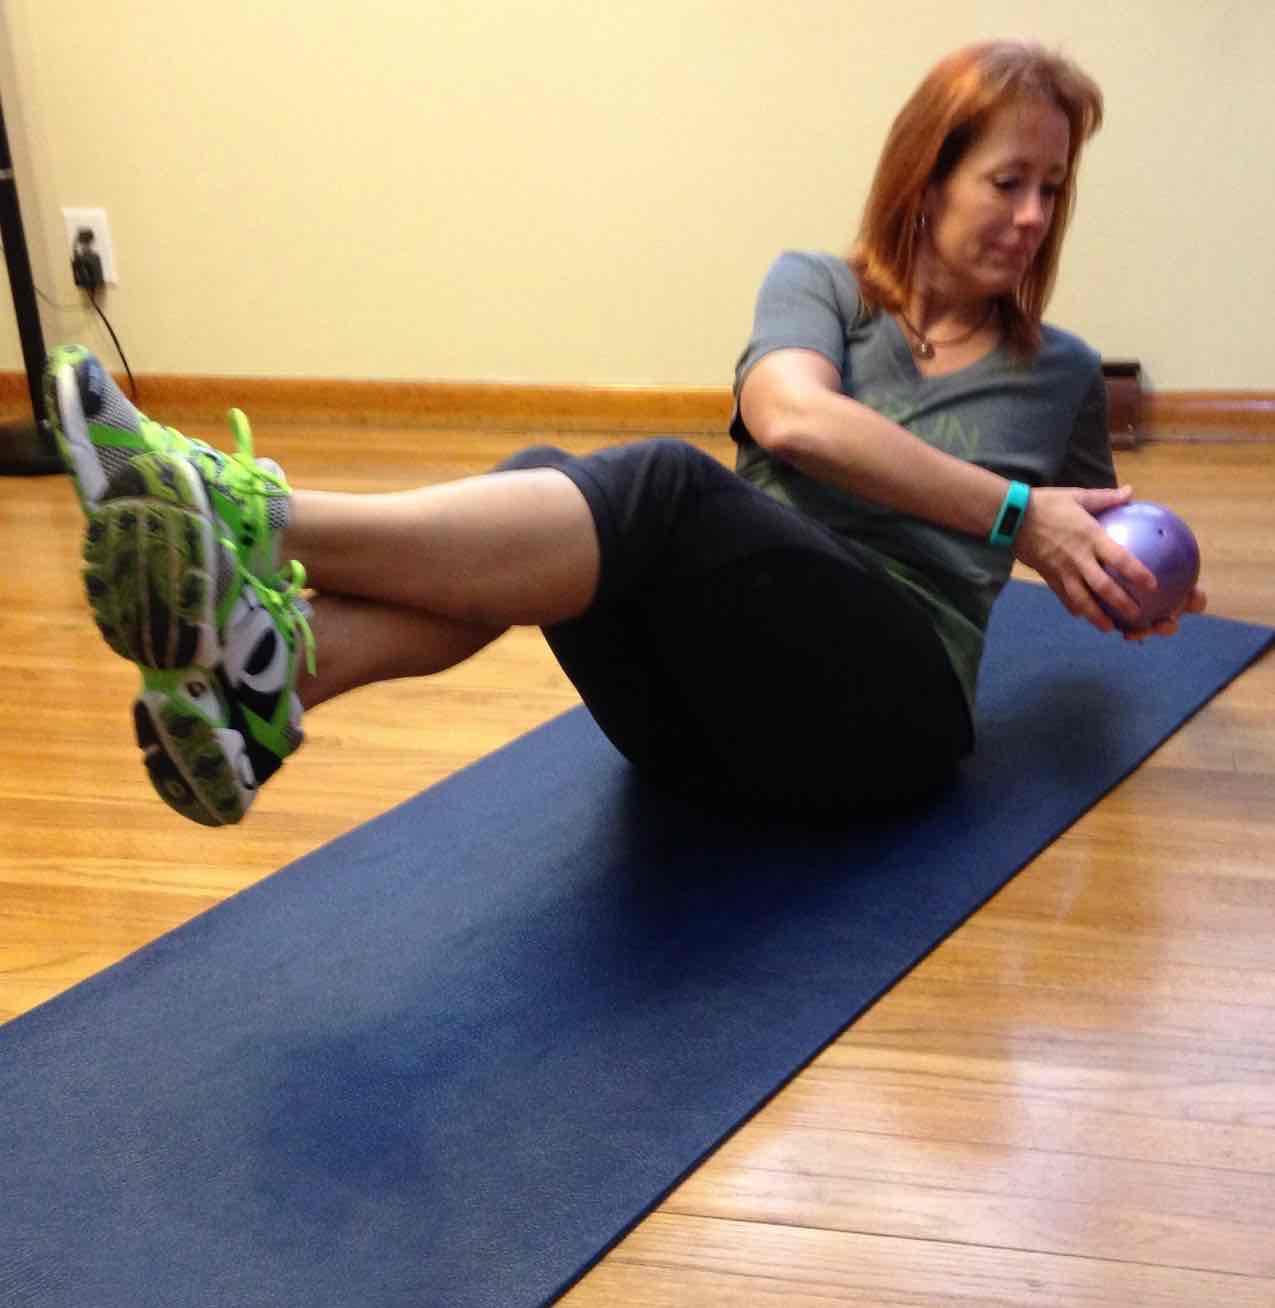 Jill russian twist feet off floor